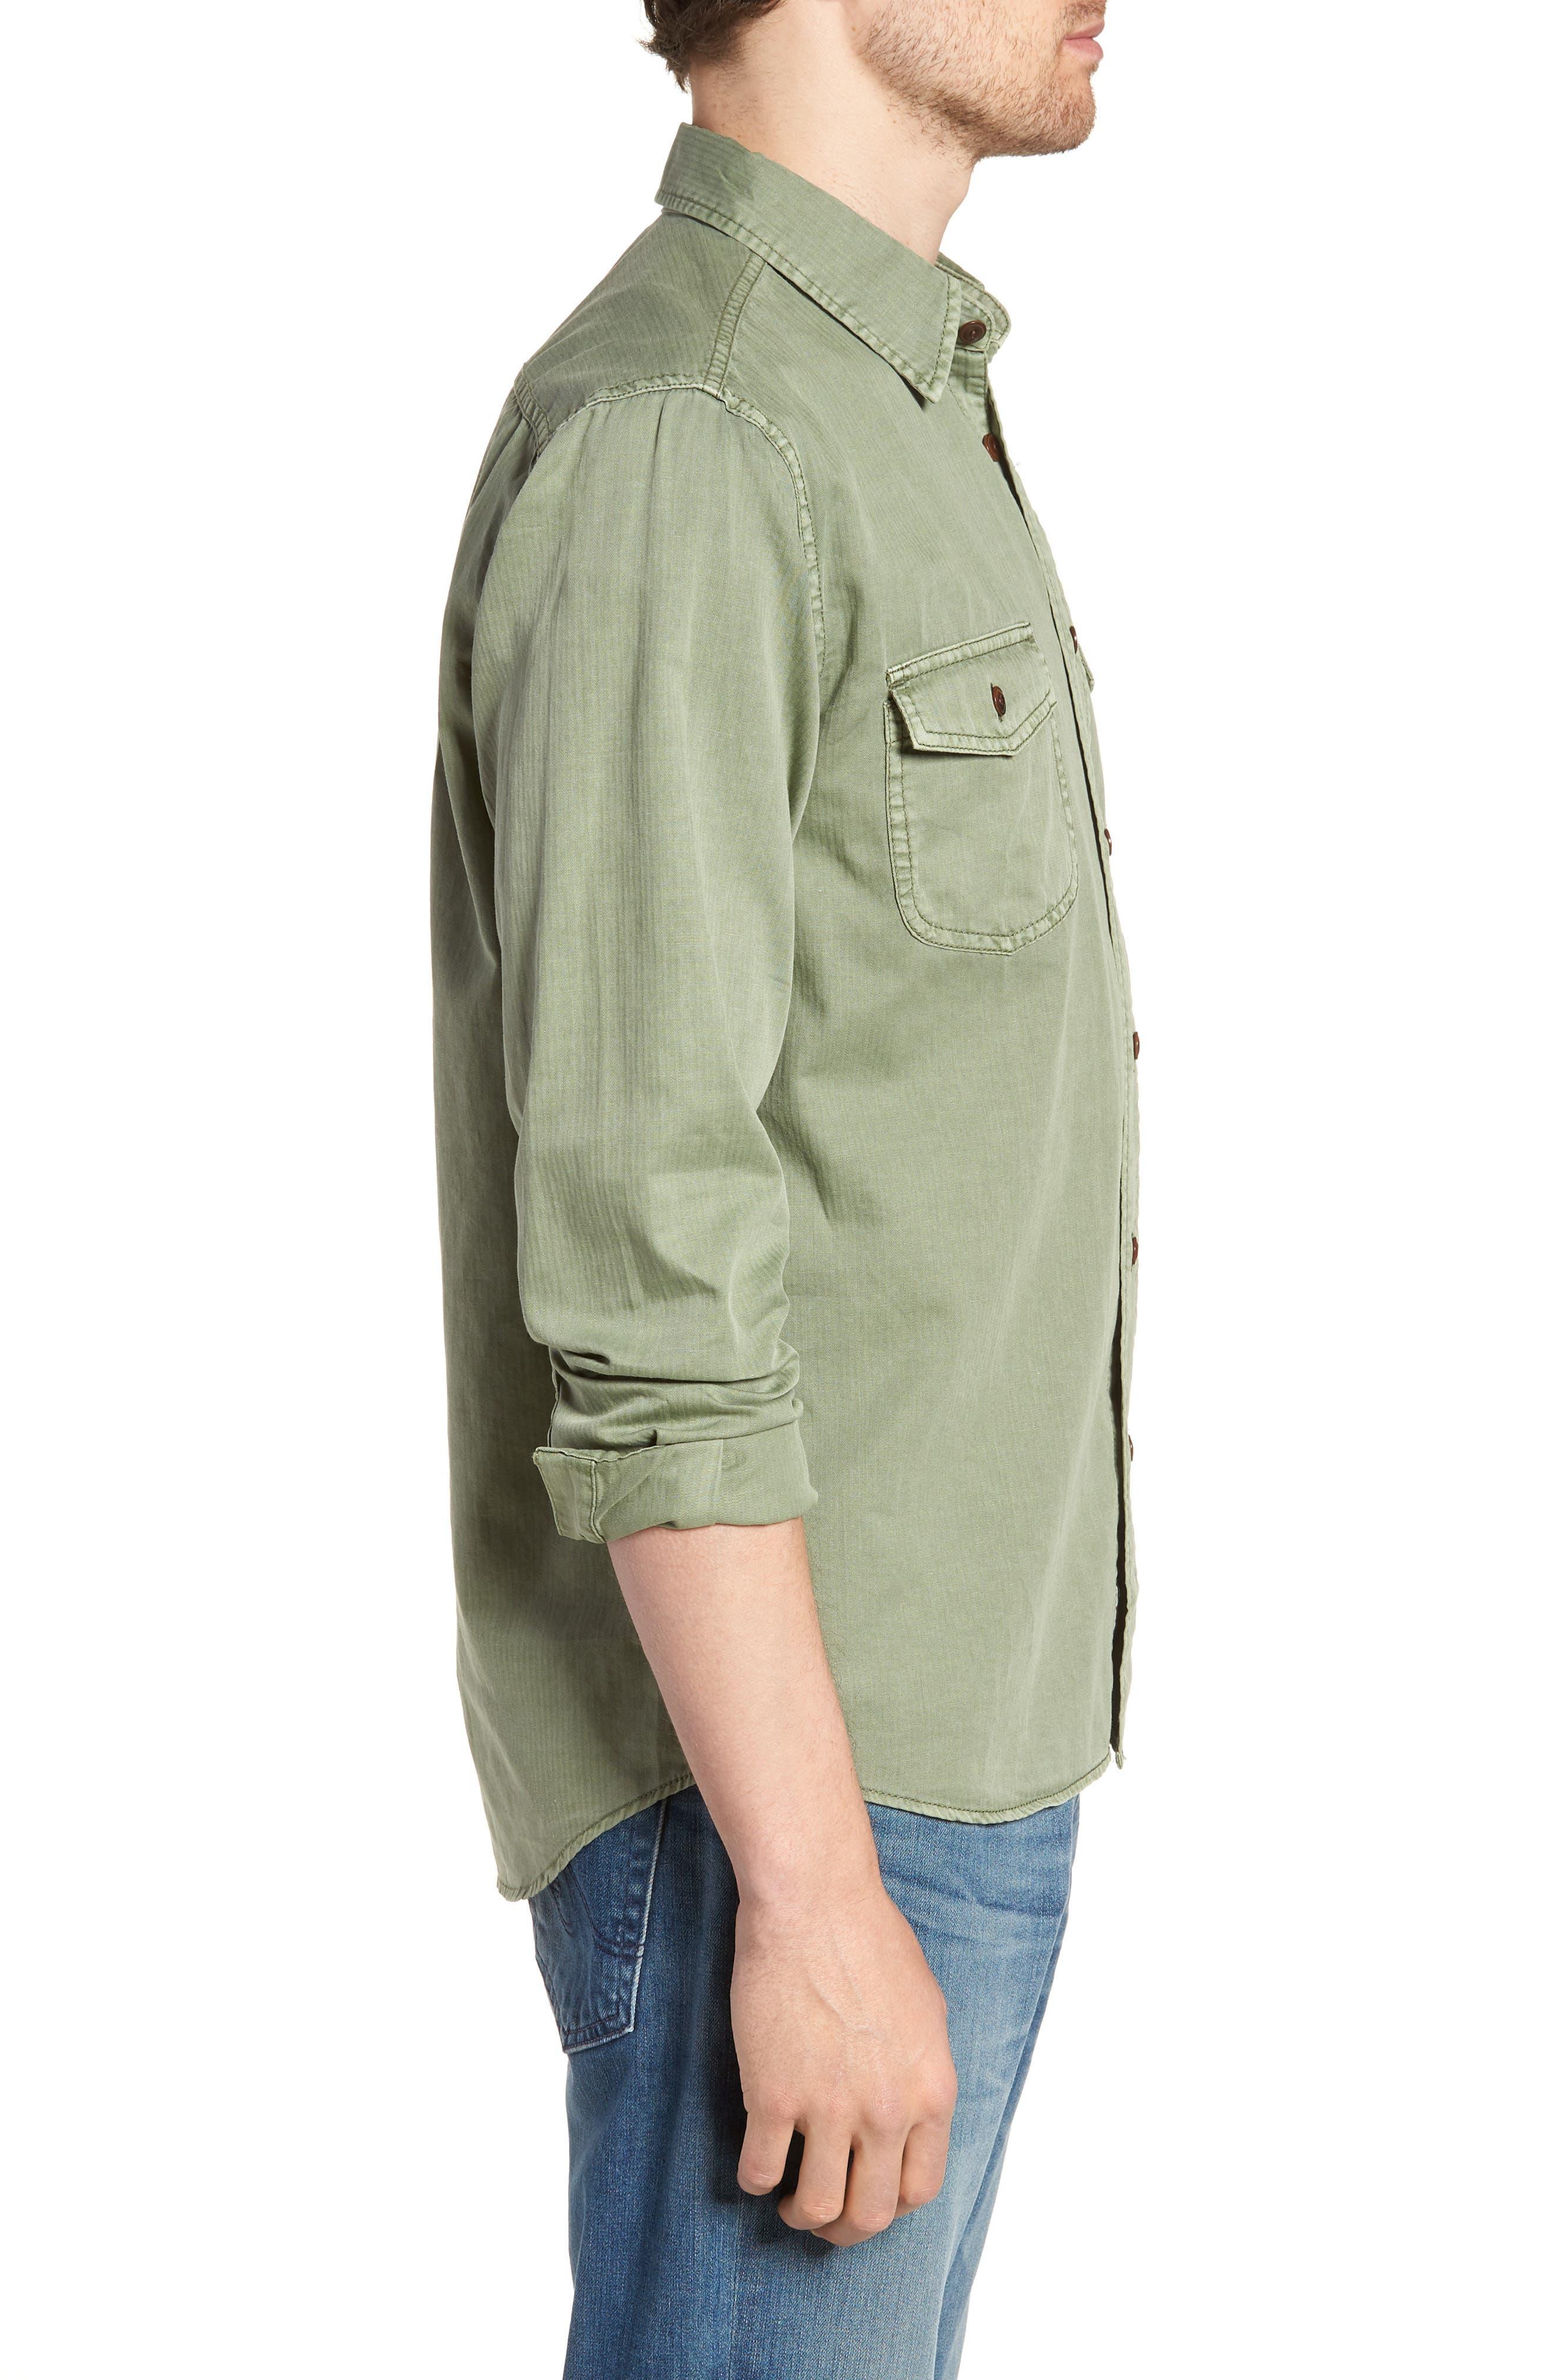 Radar Sport Shirt,                             Alternate thumbnail 3, color,                             Olive